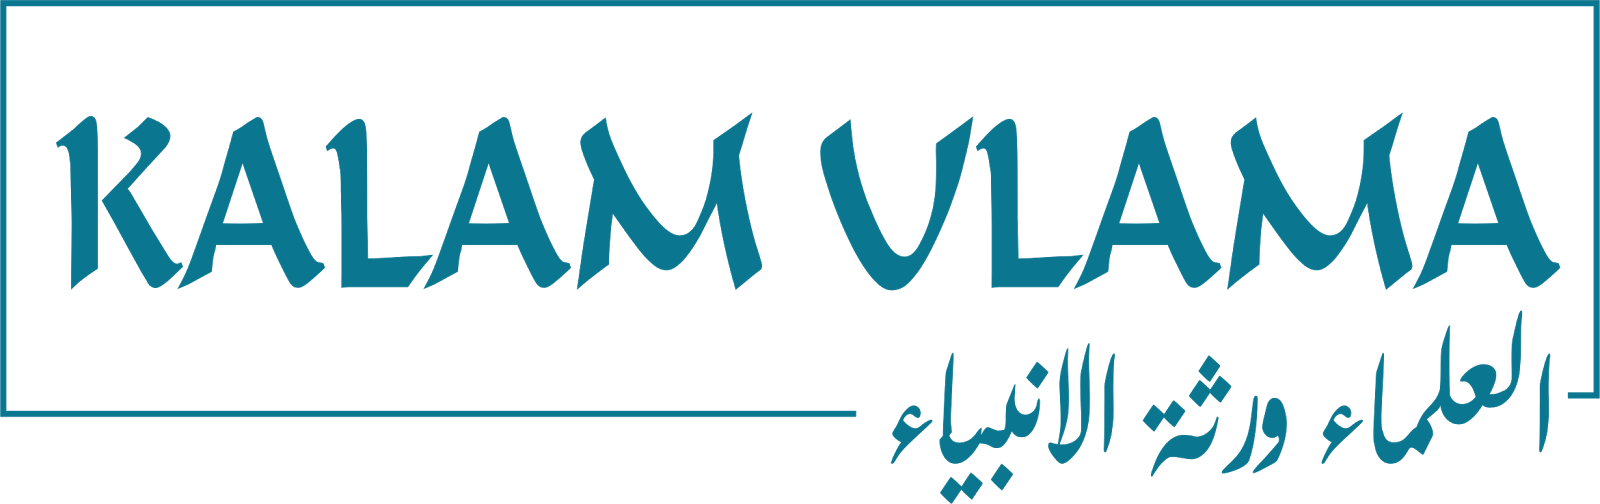 Kalam Ulama | Pewaris Para Nabi